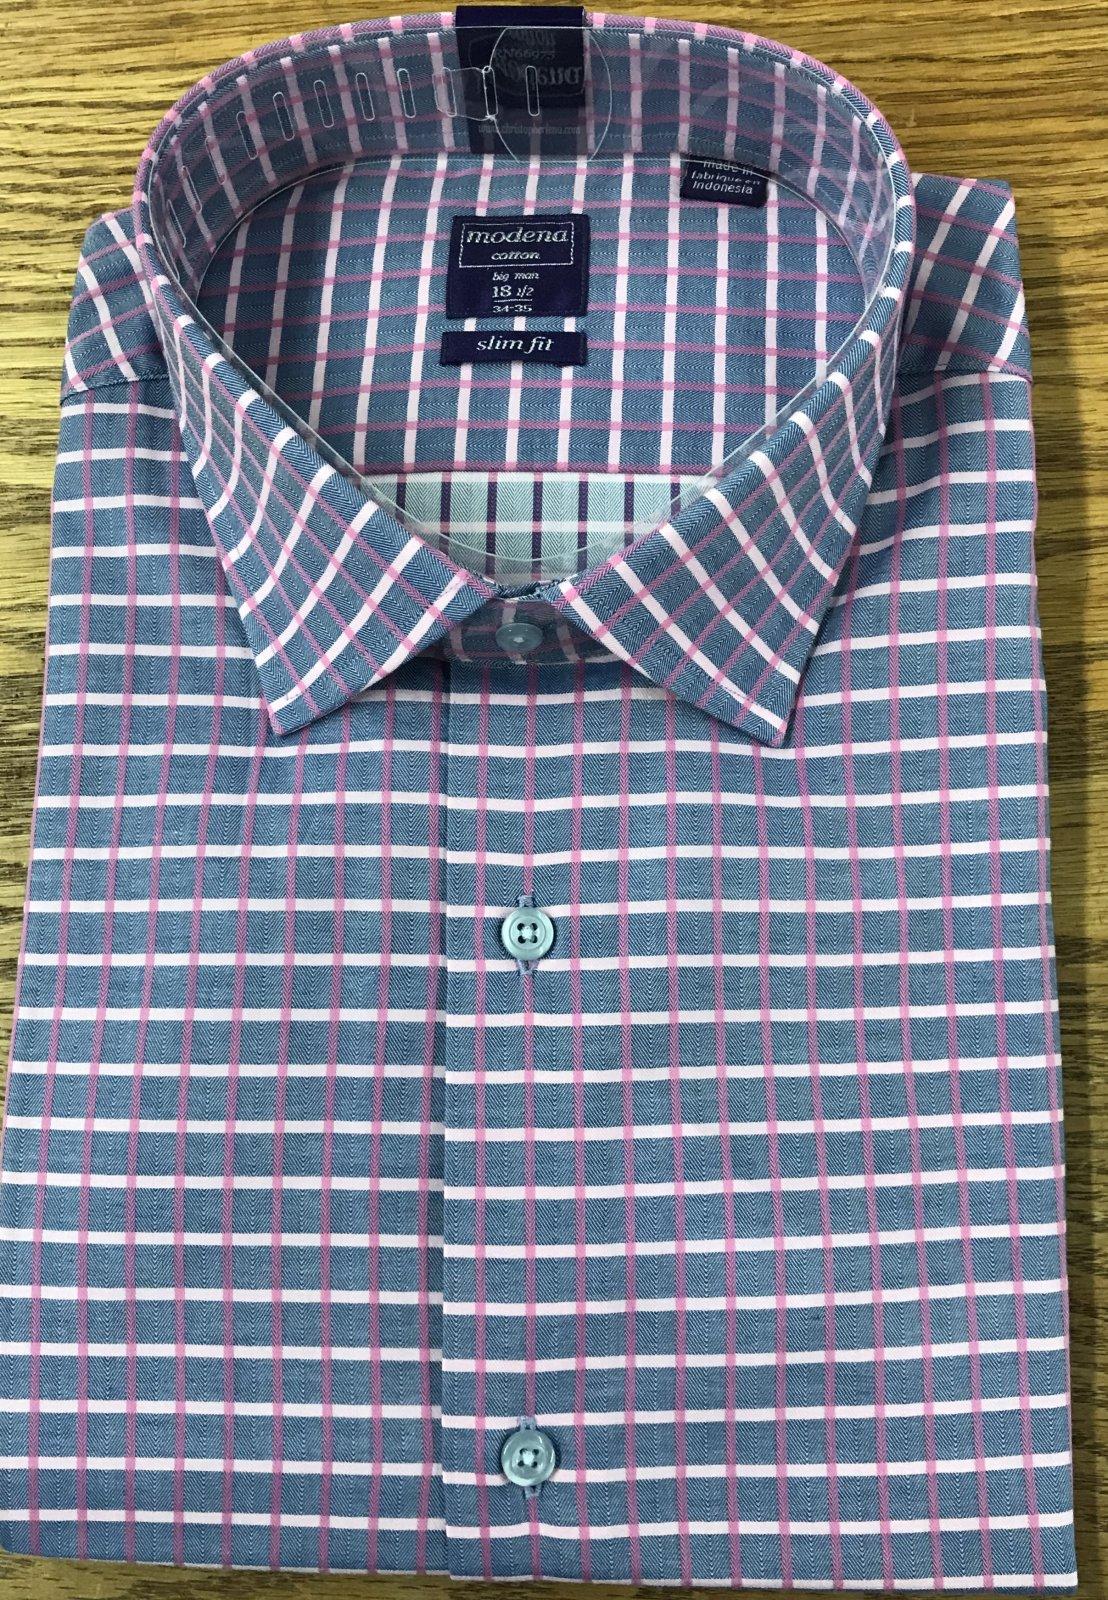 Modena Slim Fit Pink/Blue Herringbone Check